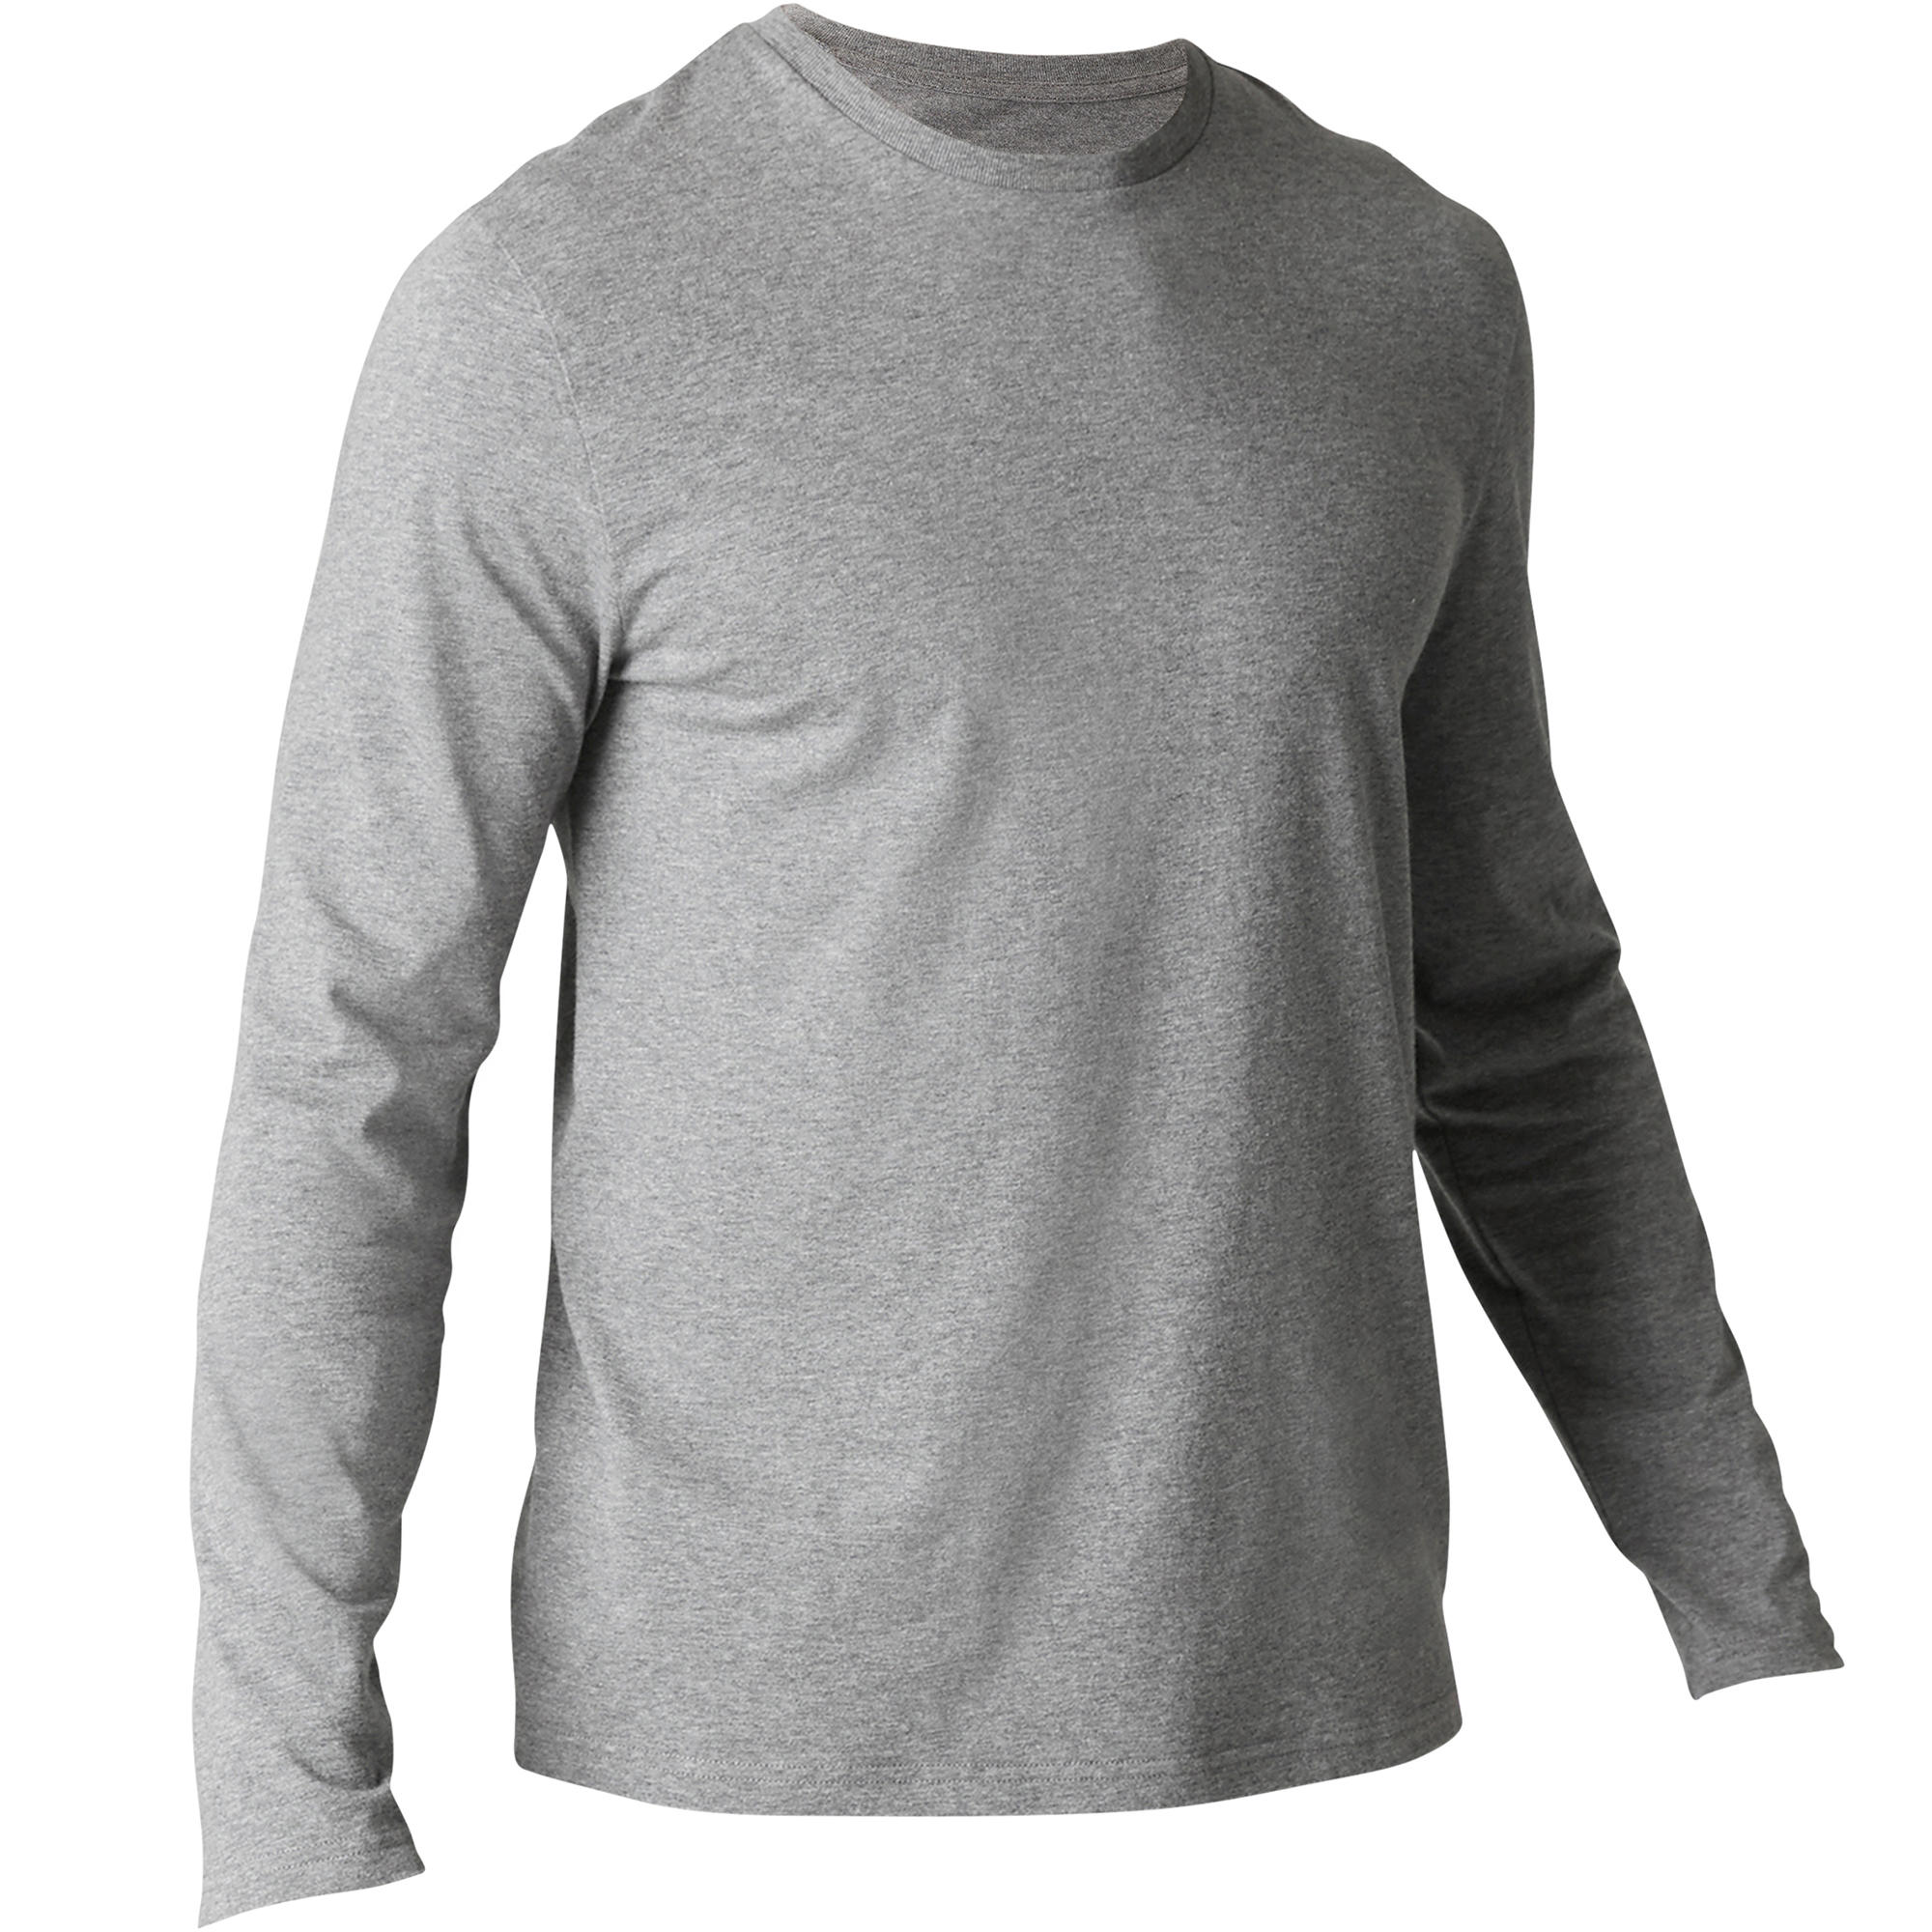 Camiseta 120 manga larga regular Pilates y Gimnasia suave hombre gris jaspeado